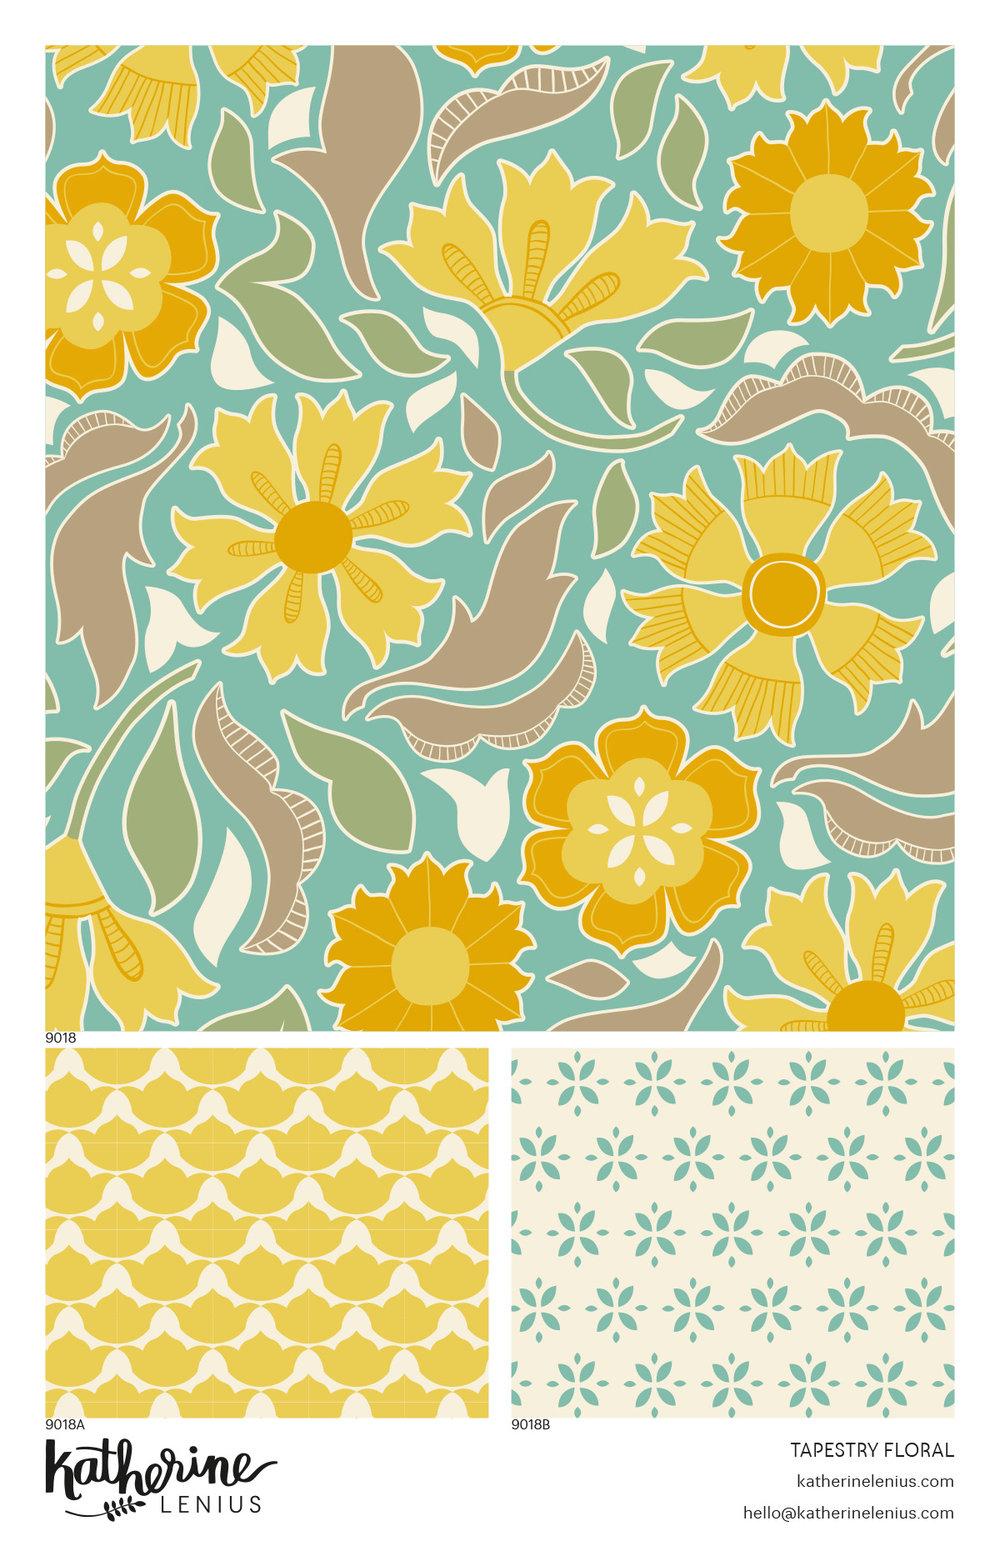 KL_9018_Tapestry Floral copy.jpg